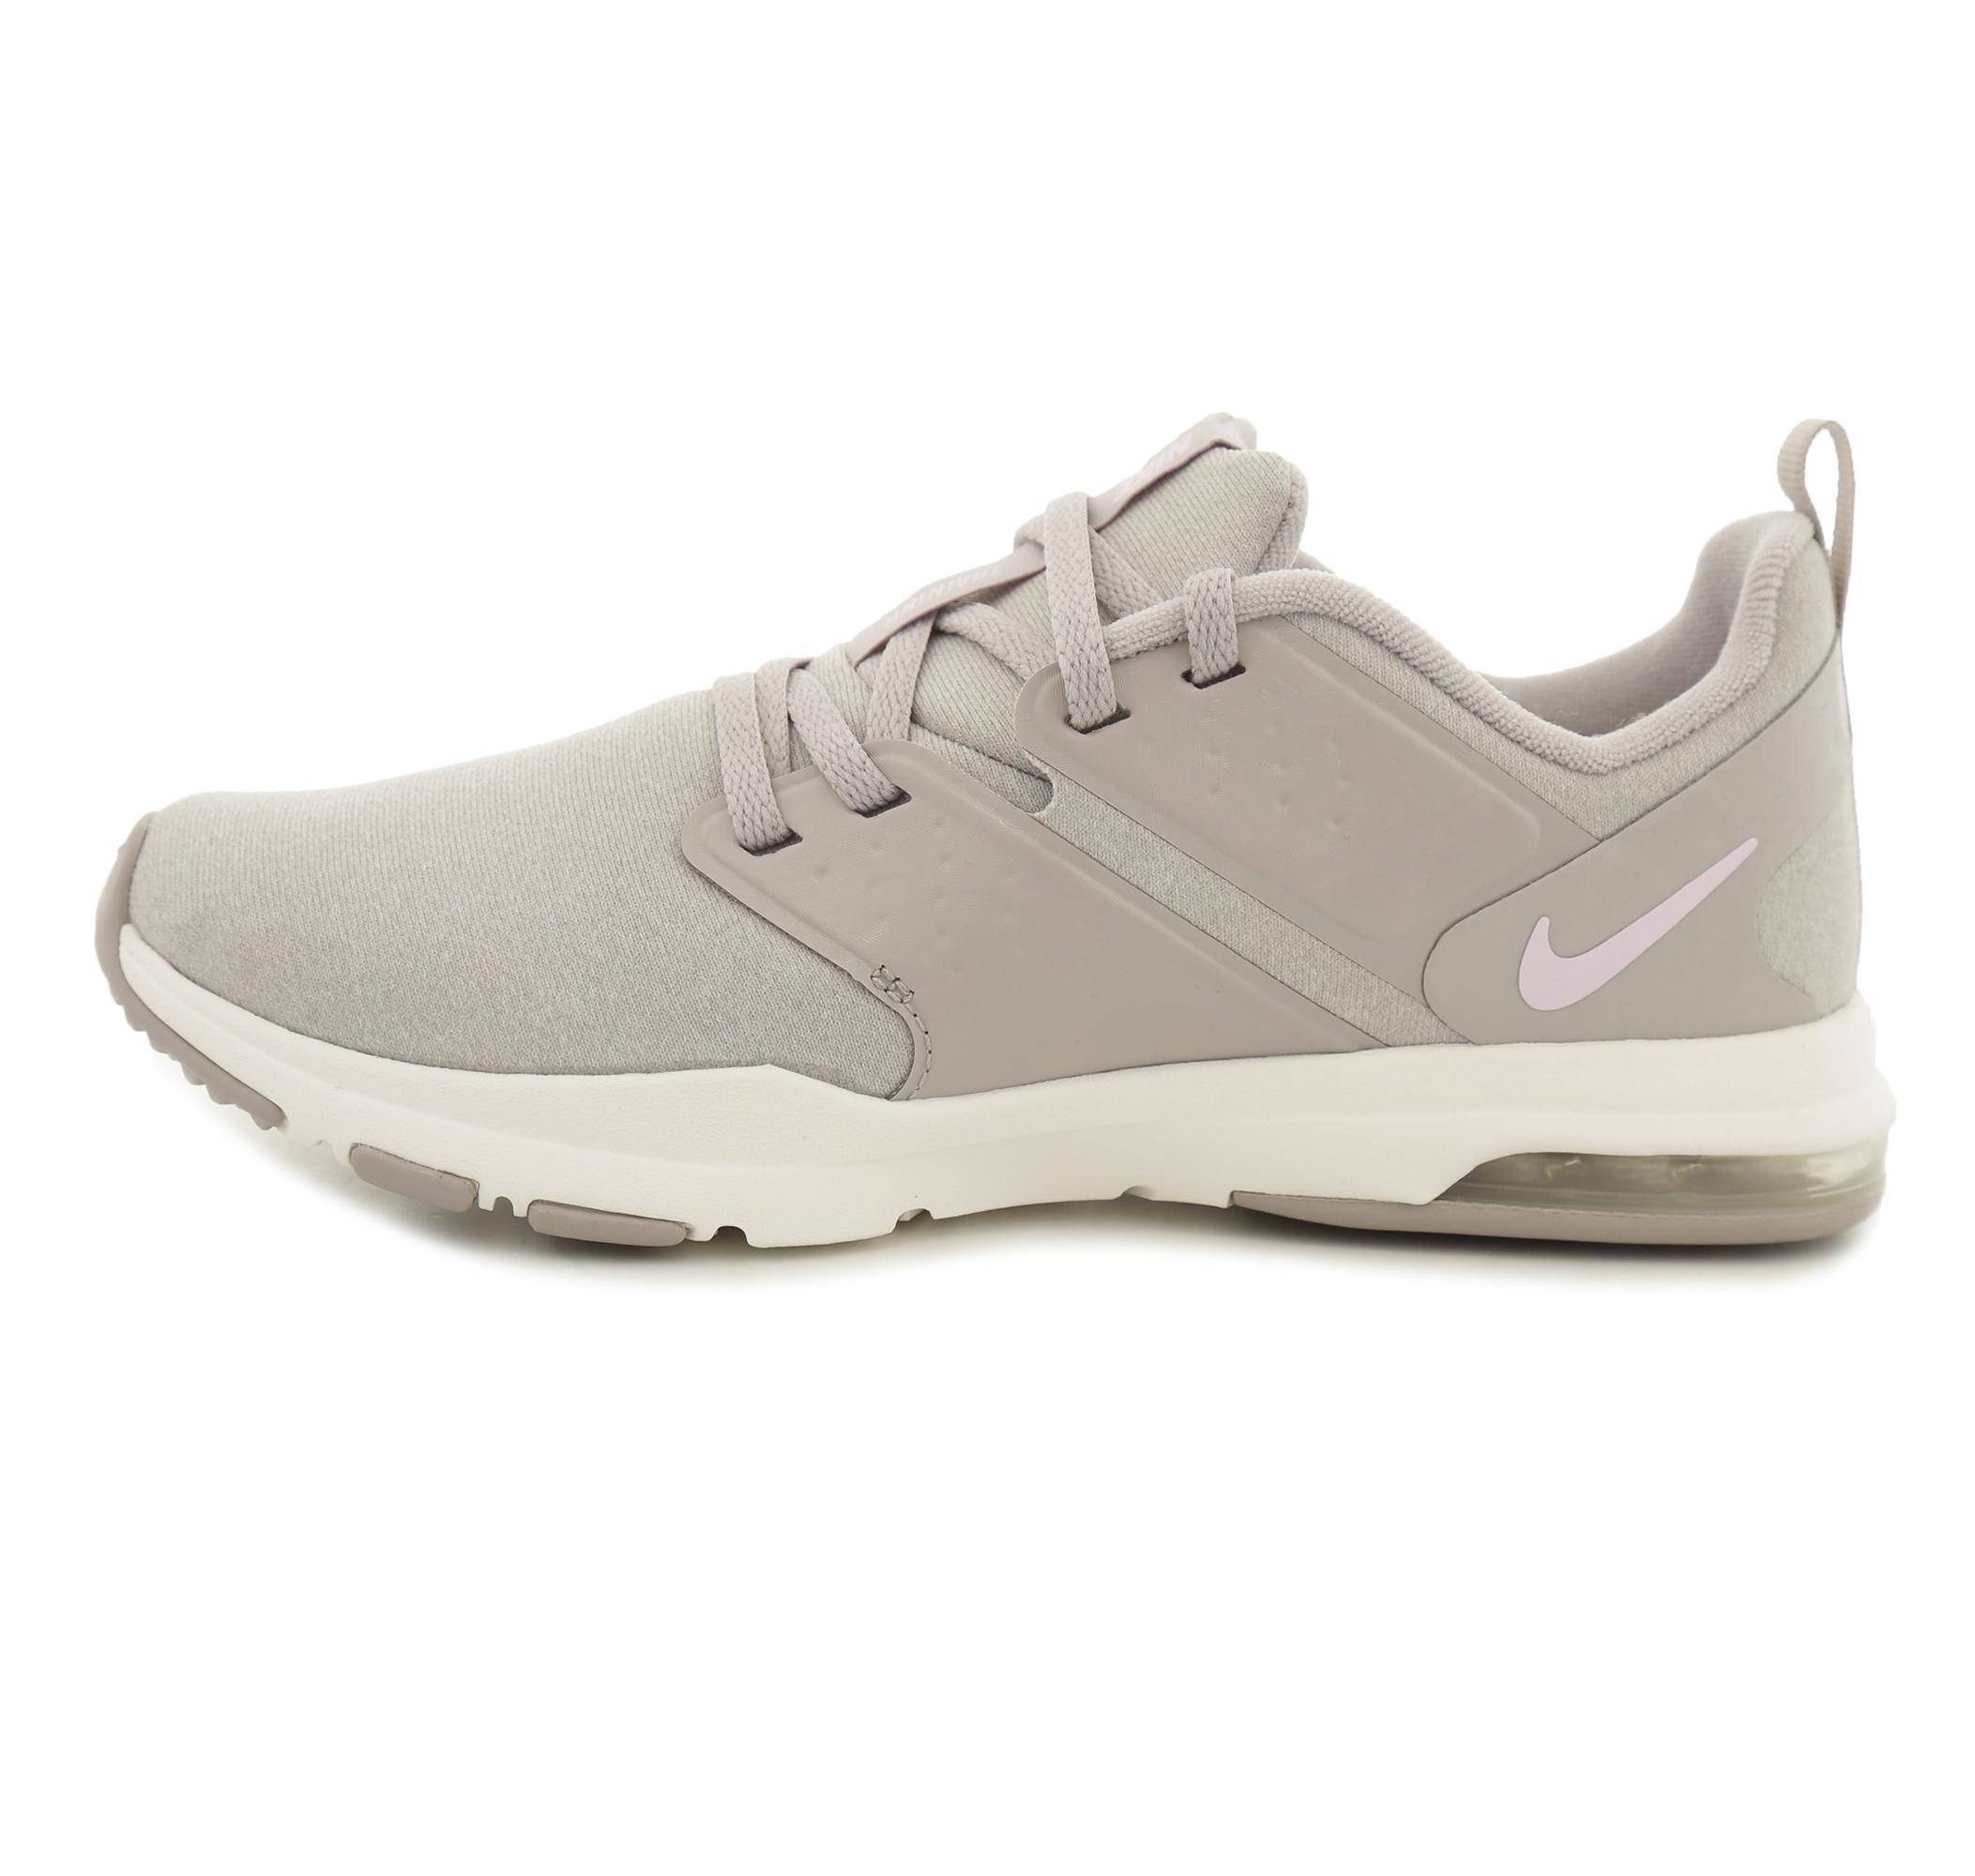 dfbdc94a7a3 Nike Wmns Nıke Aır Bella Tr Kadın Koşu Ayakkabısı Gri - Glami.com.tr